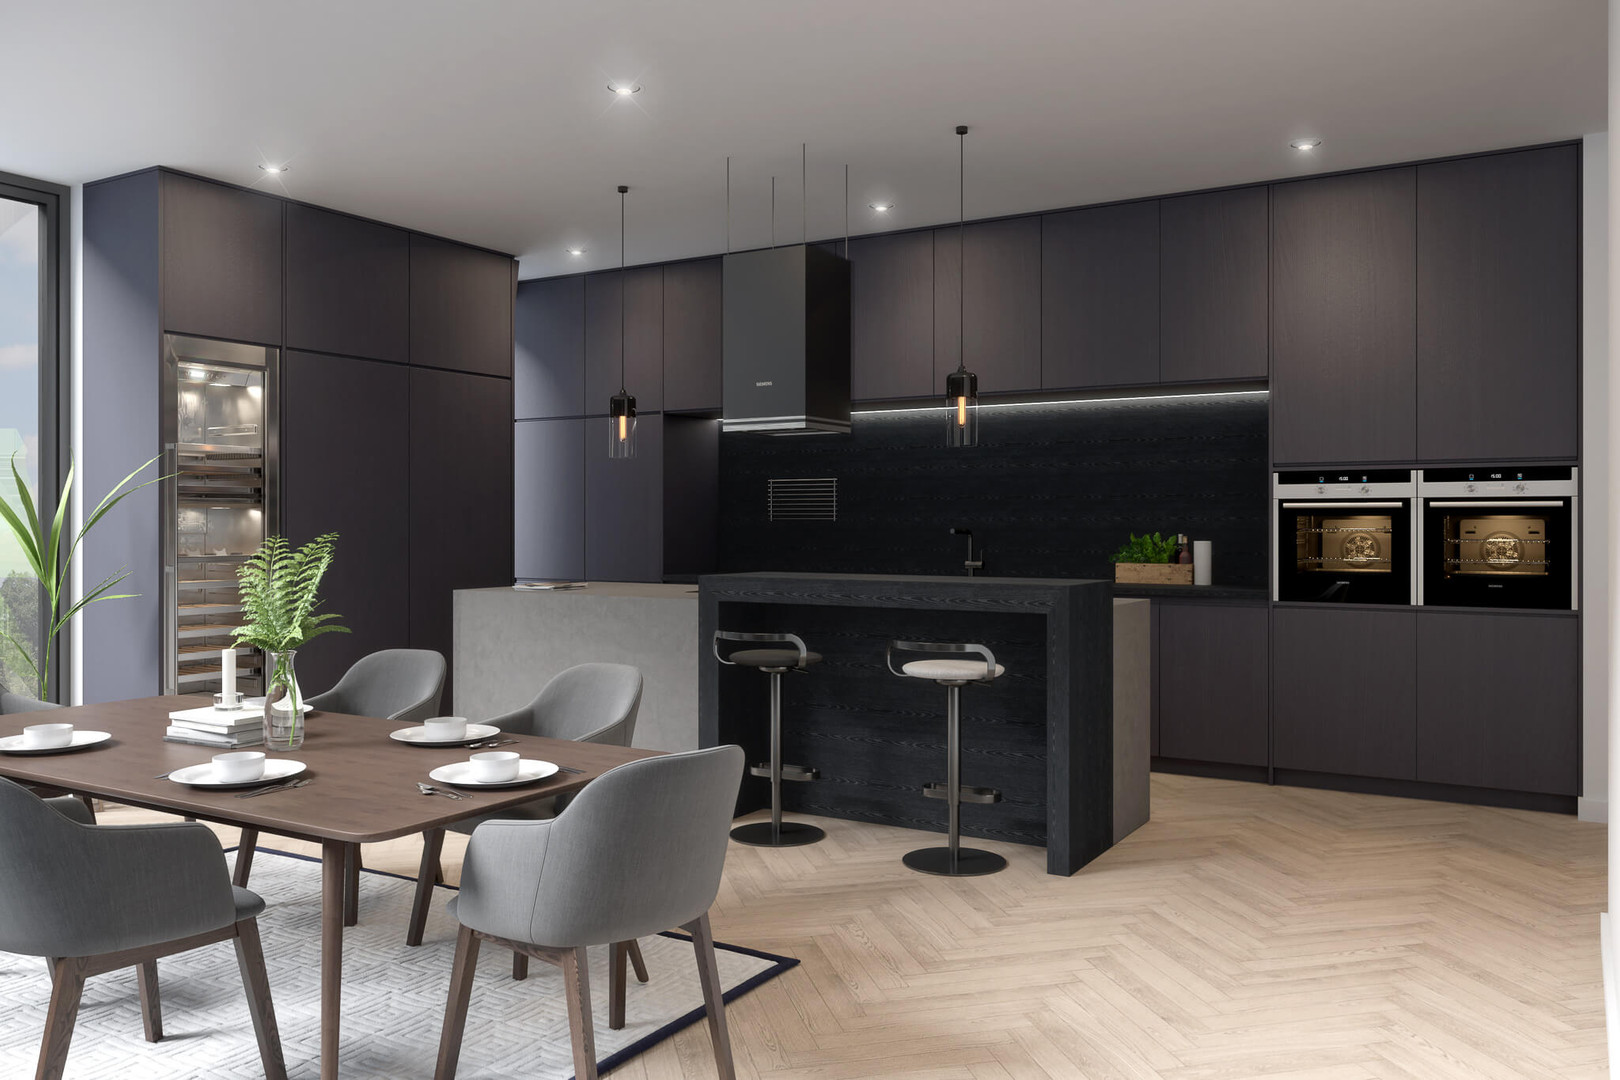 interior-cgi-lodge-hill-kitchen.jpg